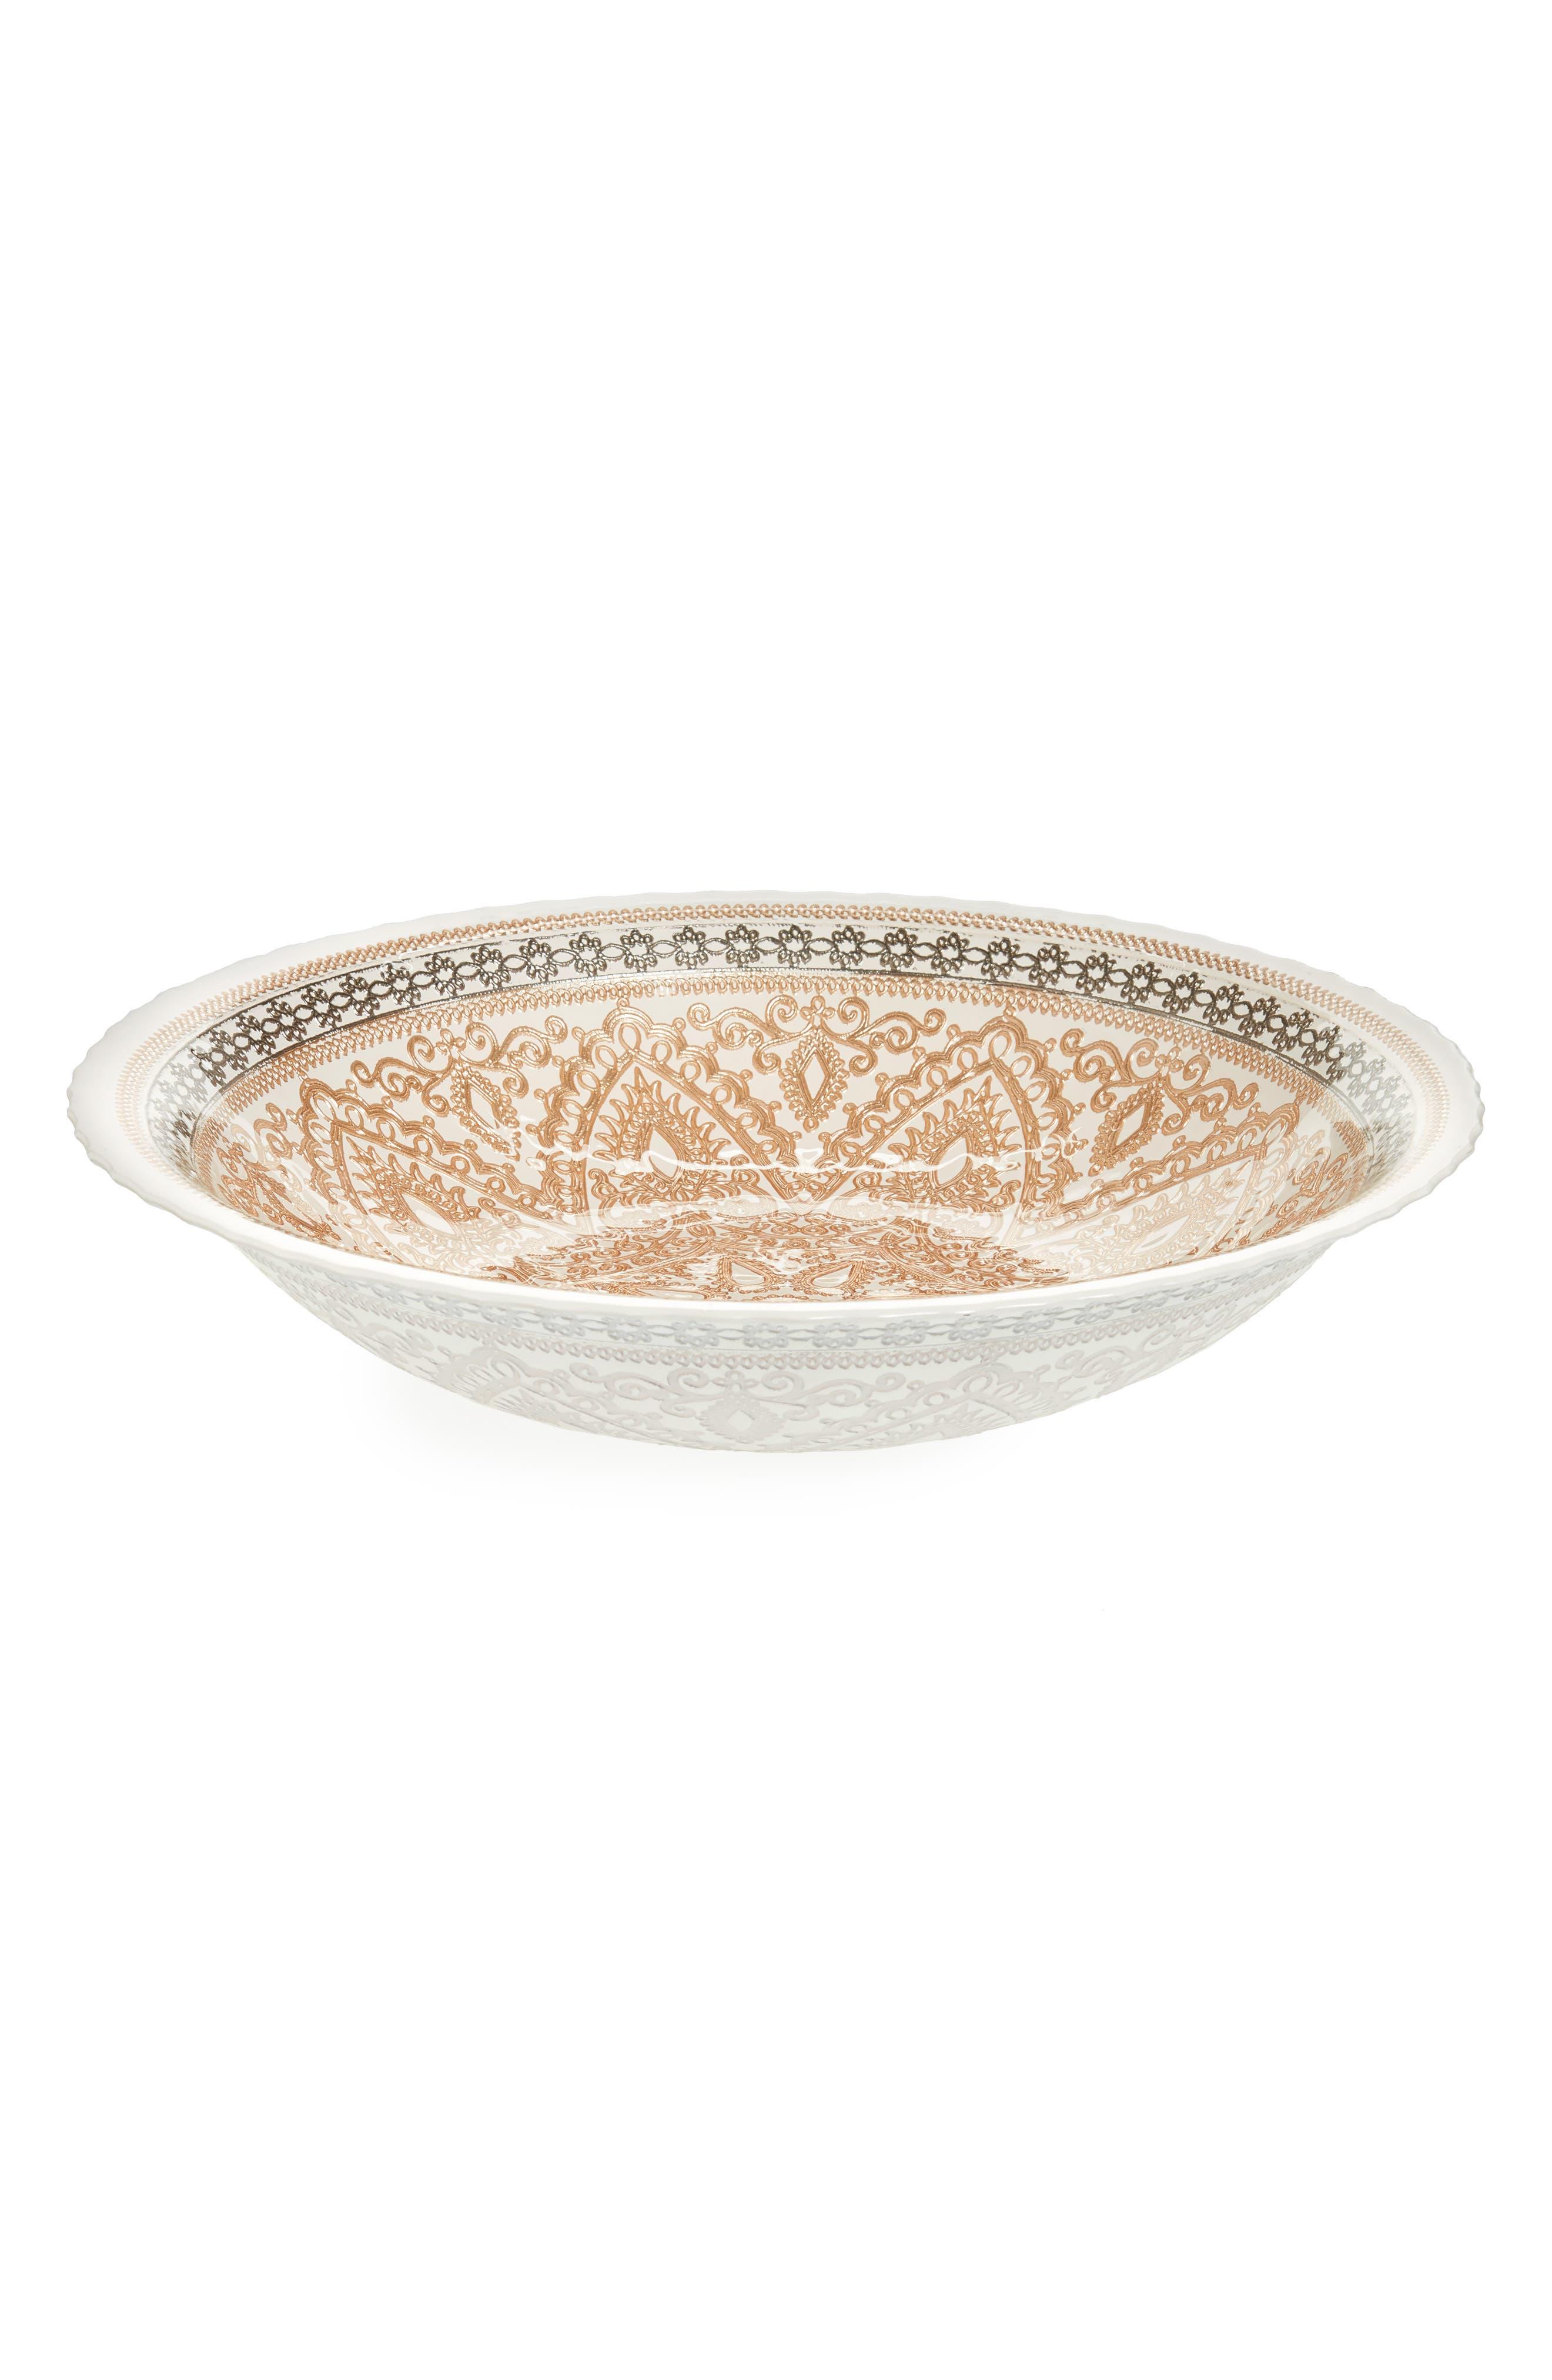 Cordoba Bowl,                             Main thumbnail 1, color,                             710